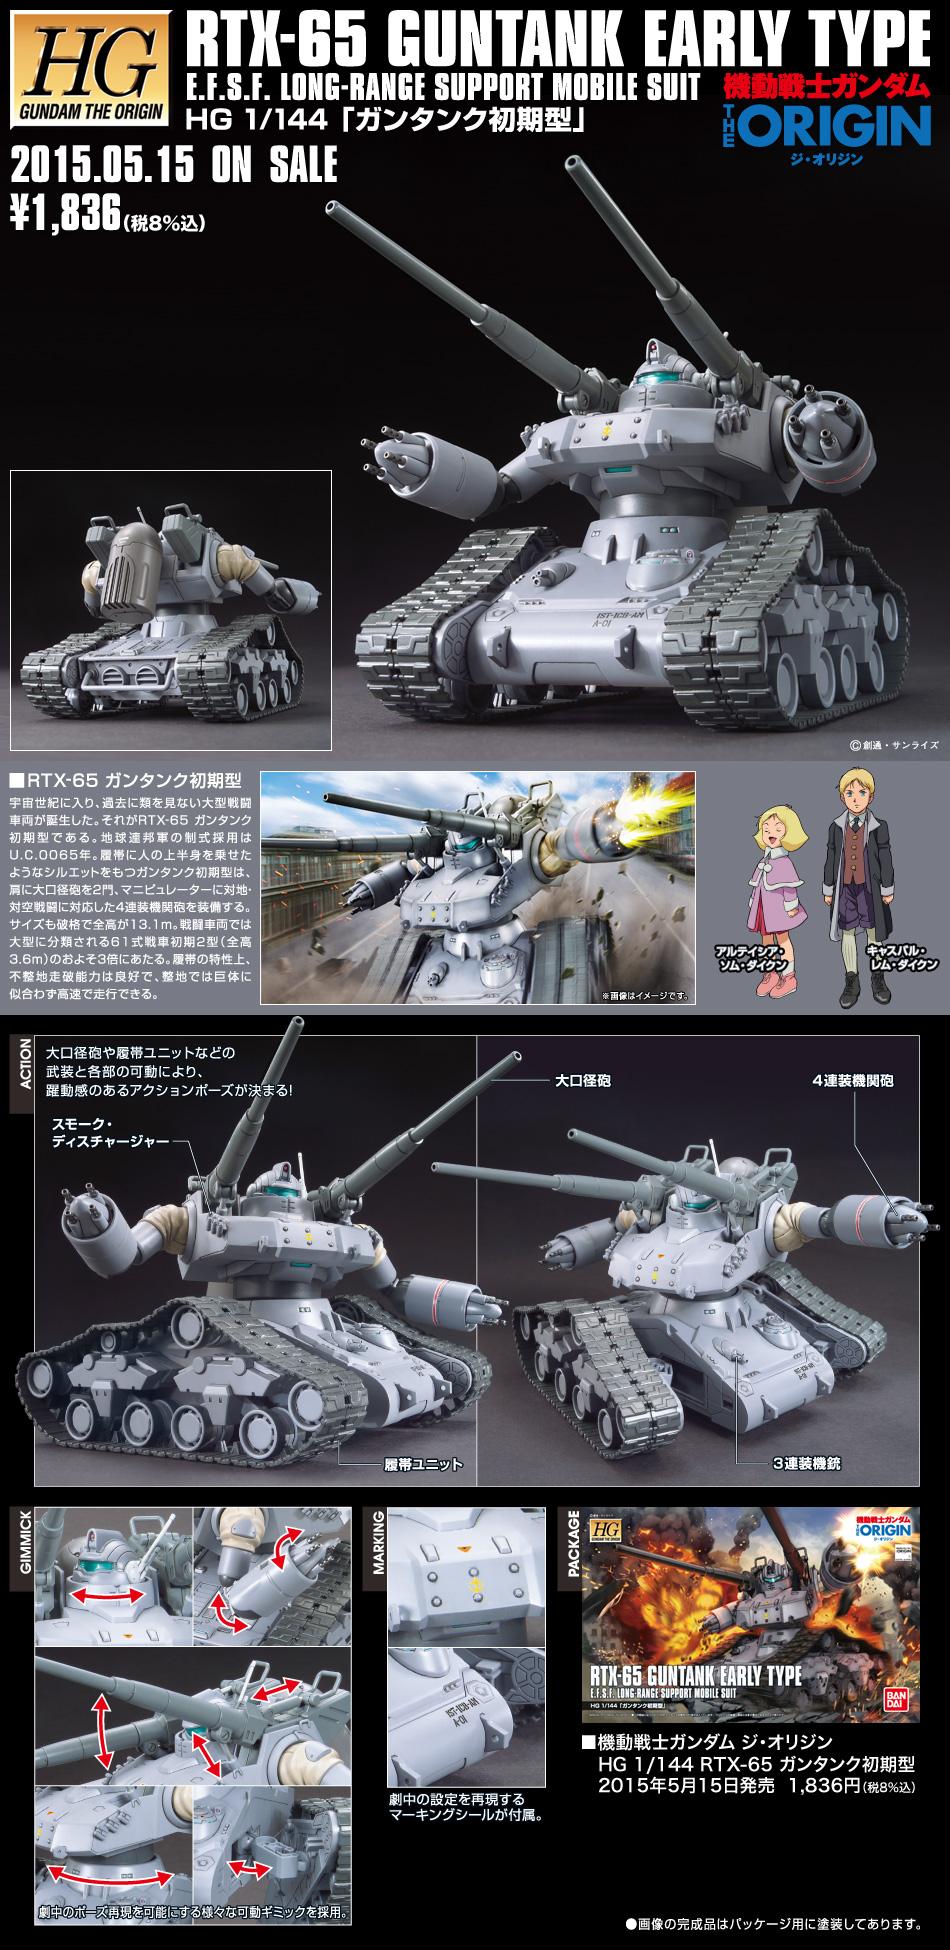 HG 1/144 RTX-65 ガンタンク初期型 公式商品説明(画像)